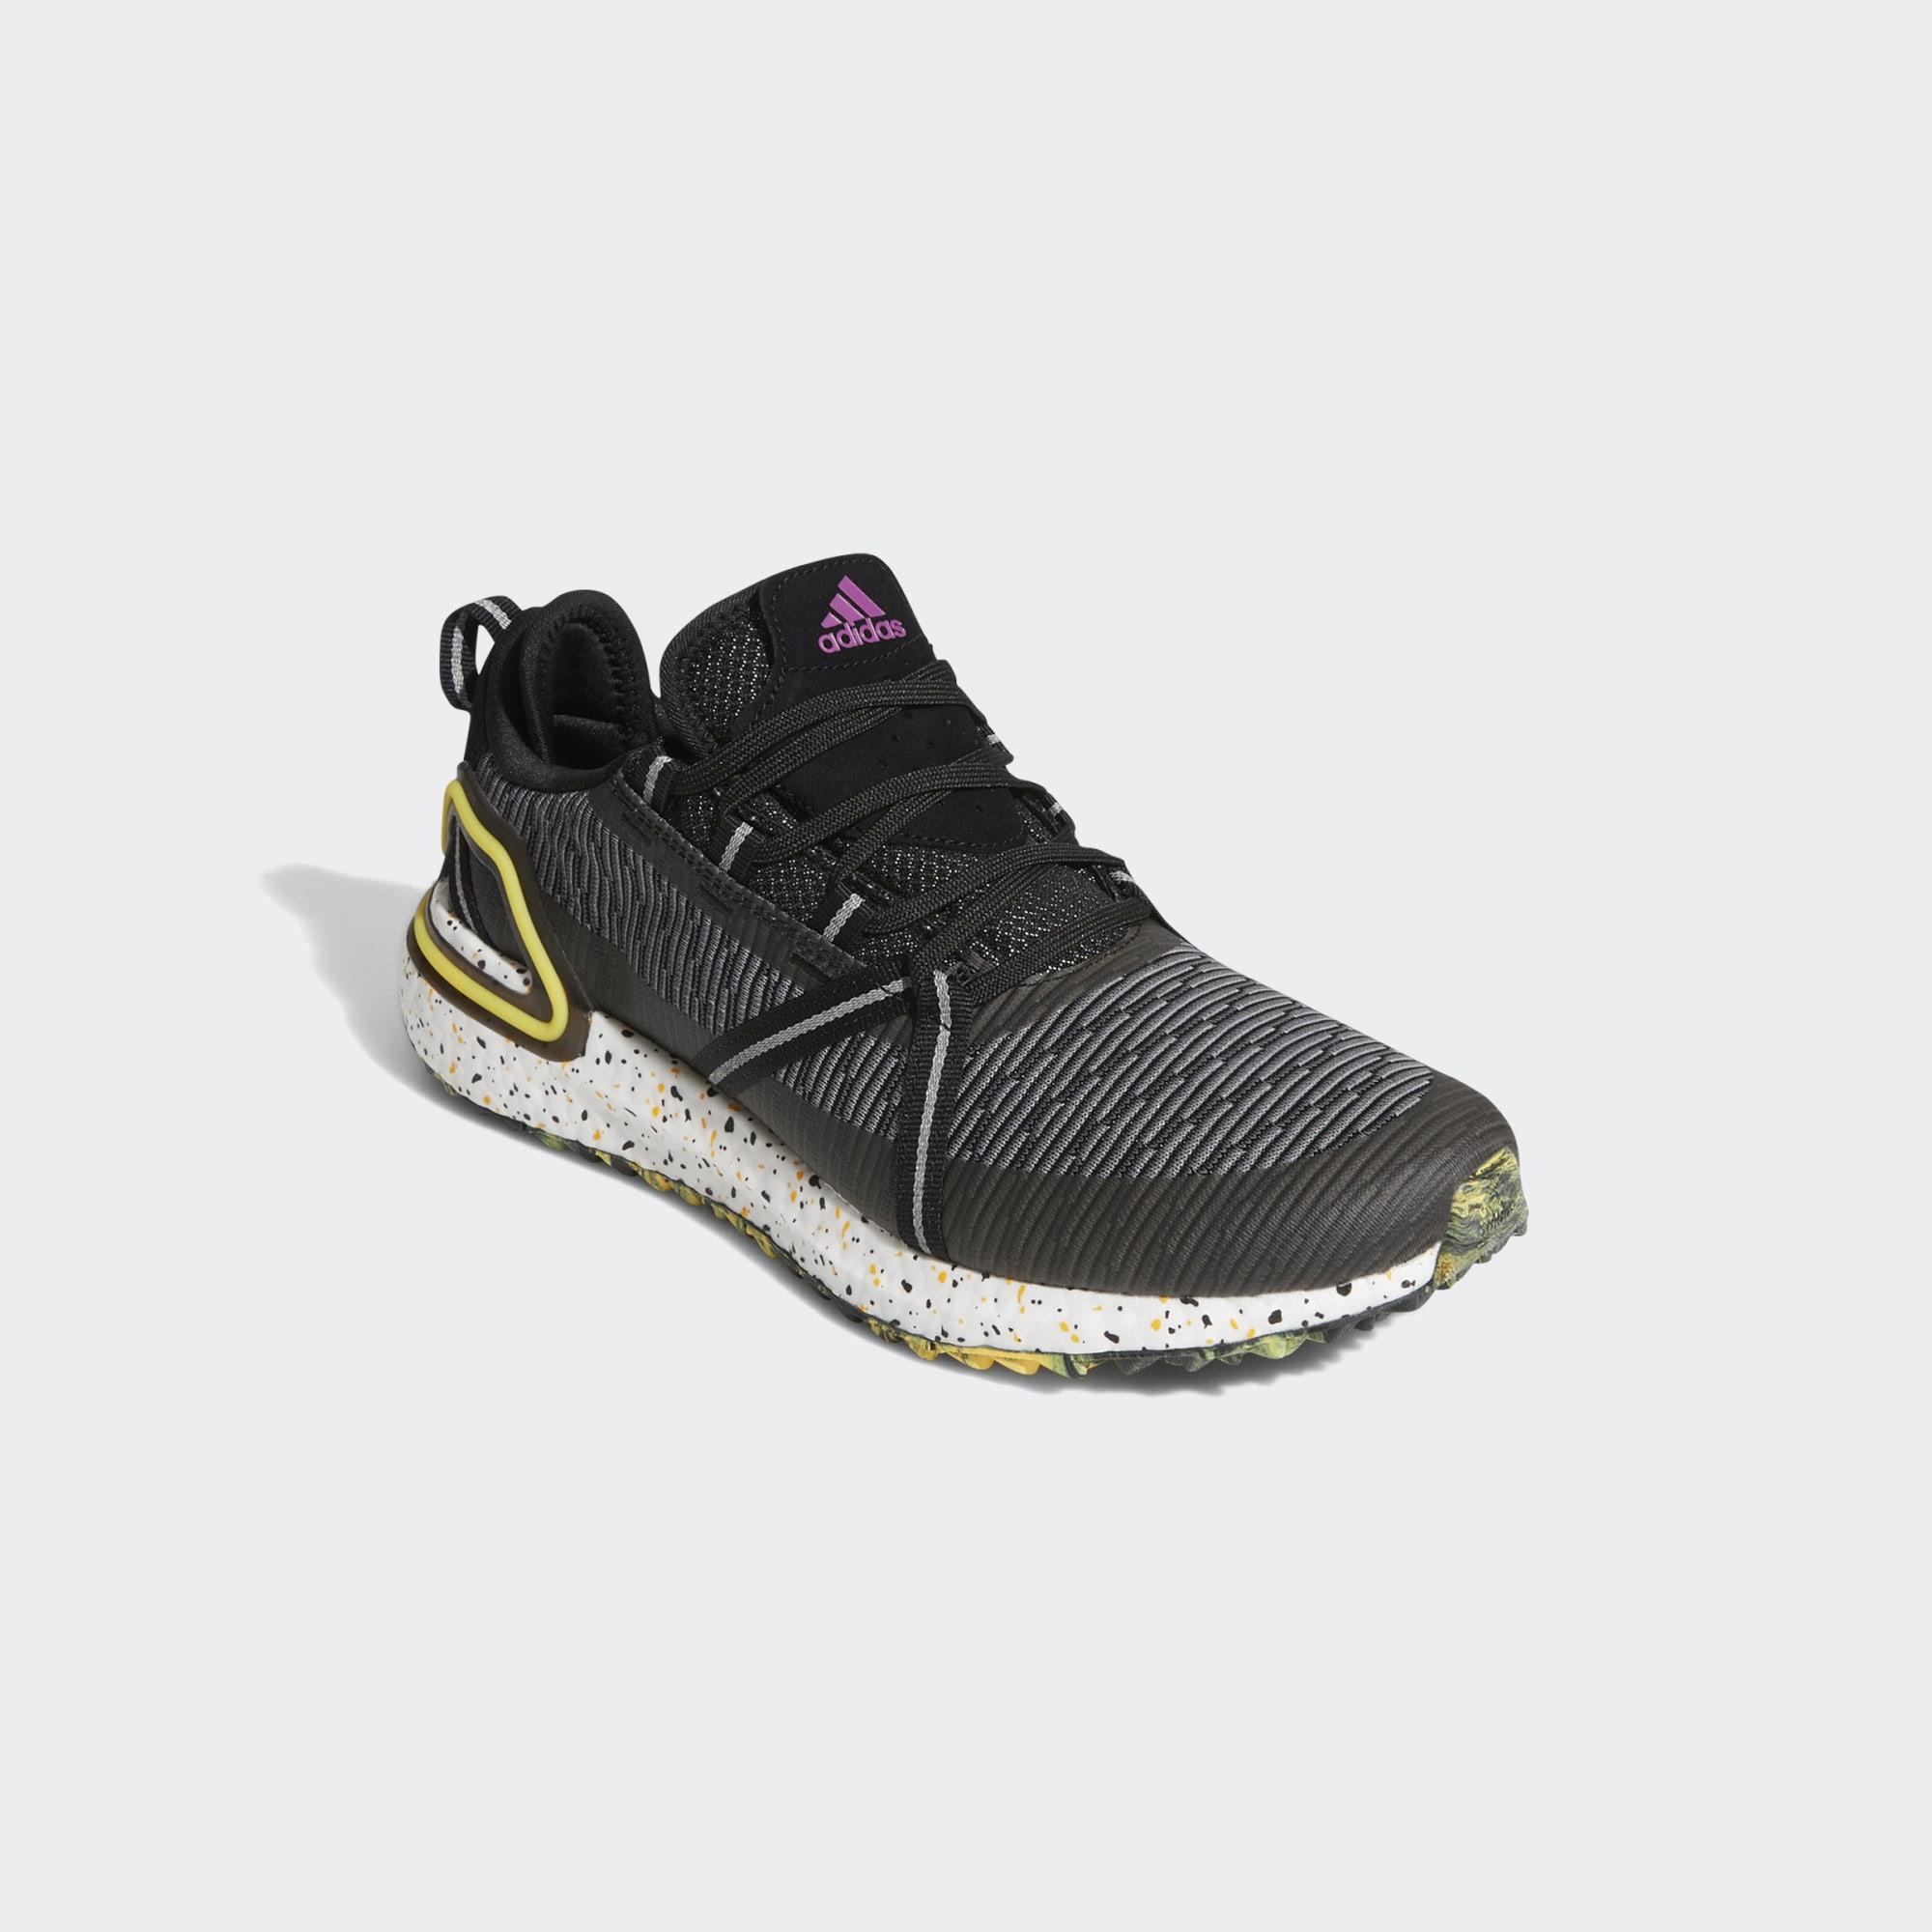 Adidas Men's Solarthon Primegreen Spikeless Golf Shoes - Core Black/Solar Gold